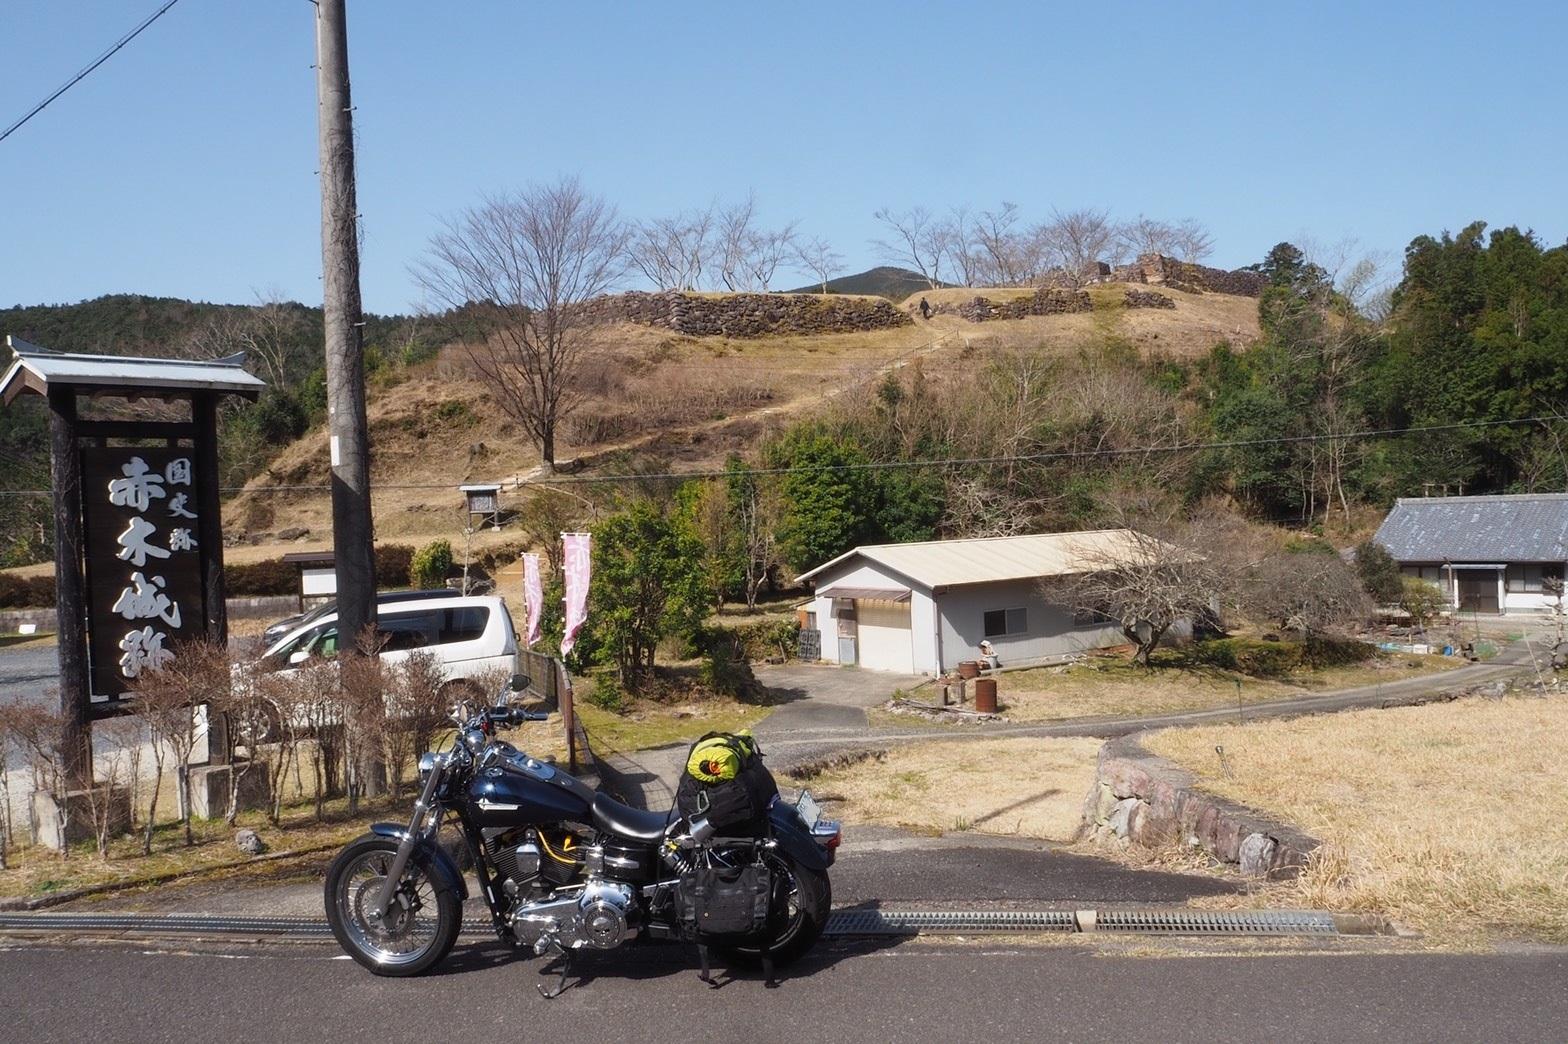 harleydavidson-motorcycle-touring-blog-mie-akagi-castleruins.jpg